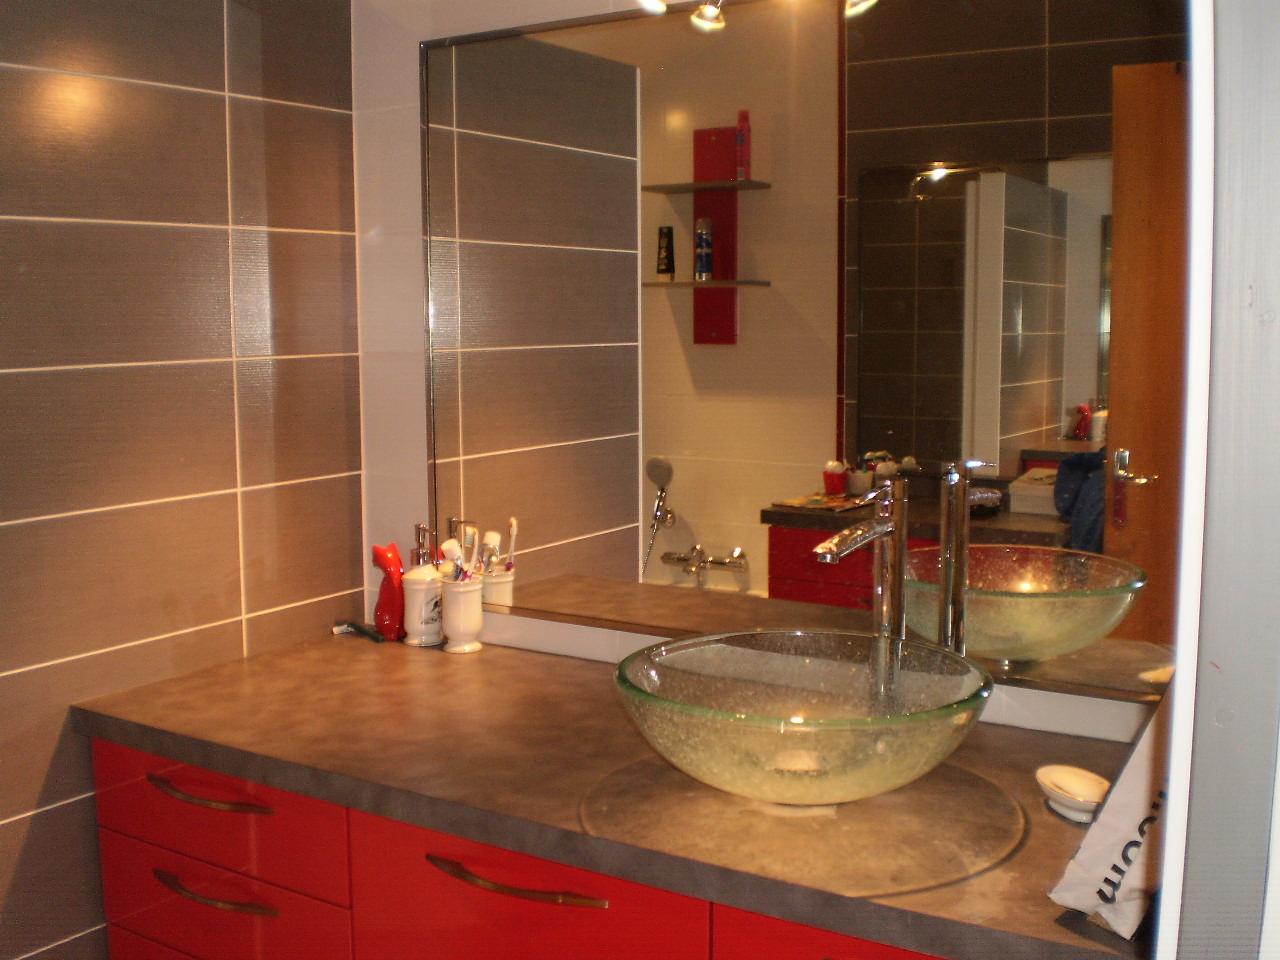 100 norme electrique salle bain pmr salle bain pmr for Salle bain handicape